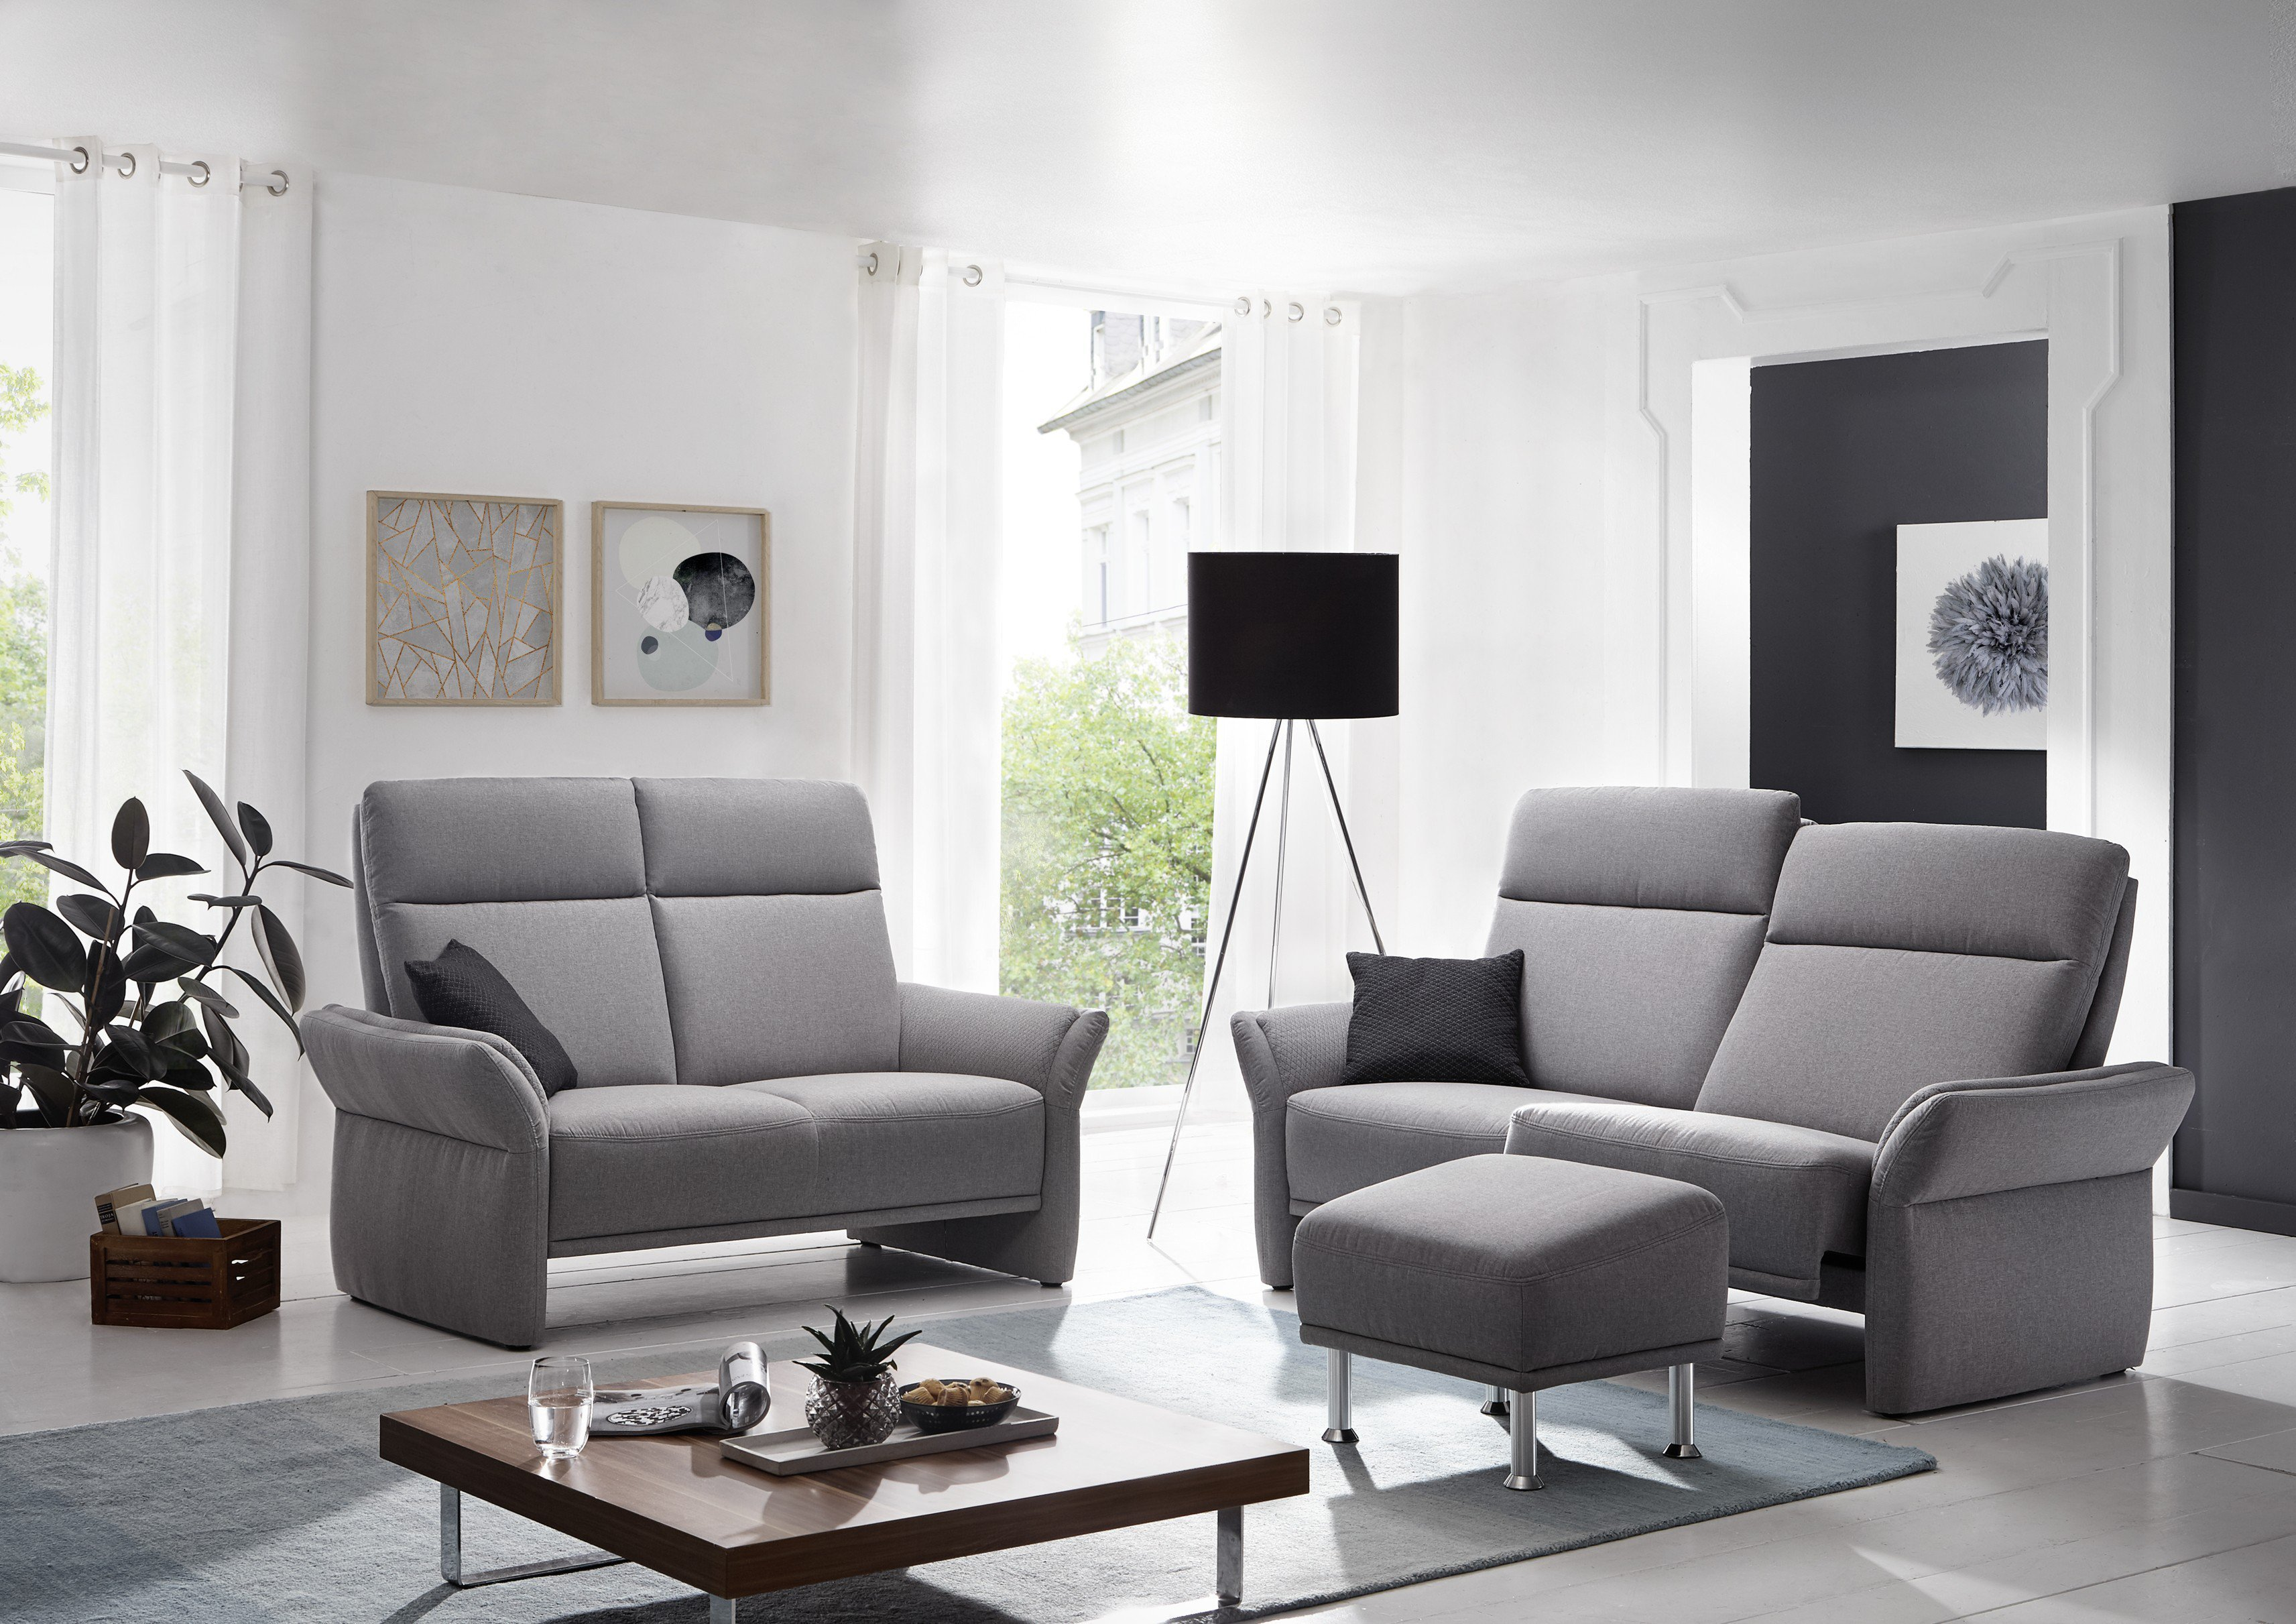 gruber polsterm bel lugana sofagarnitur in hellgrau. Black Bedroom Furniture Sets. Home Design Ideas